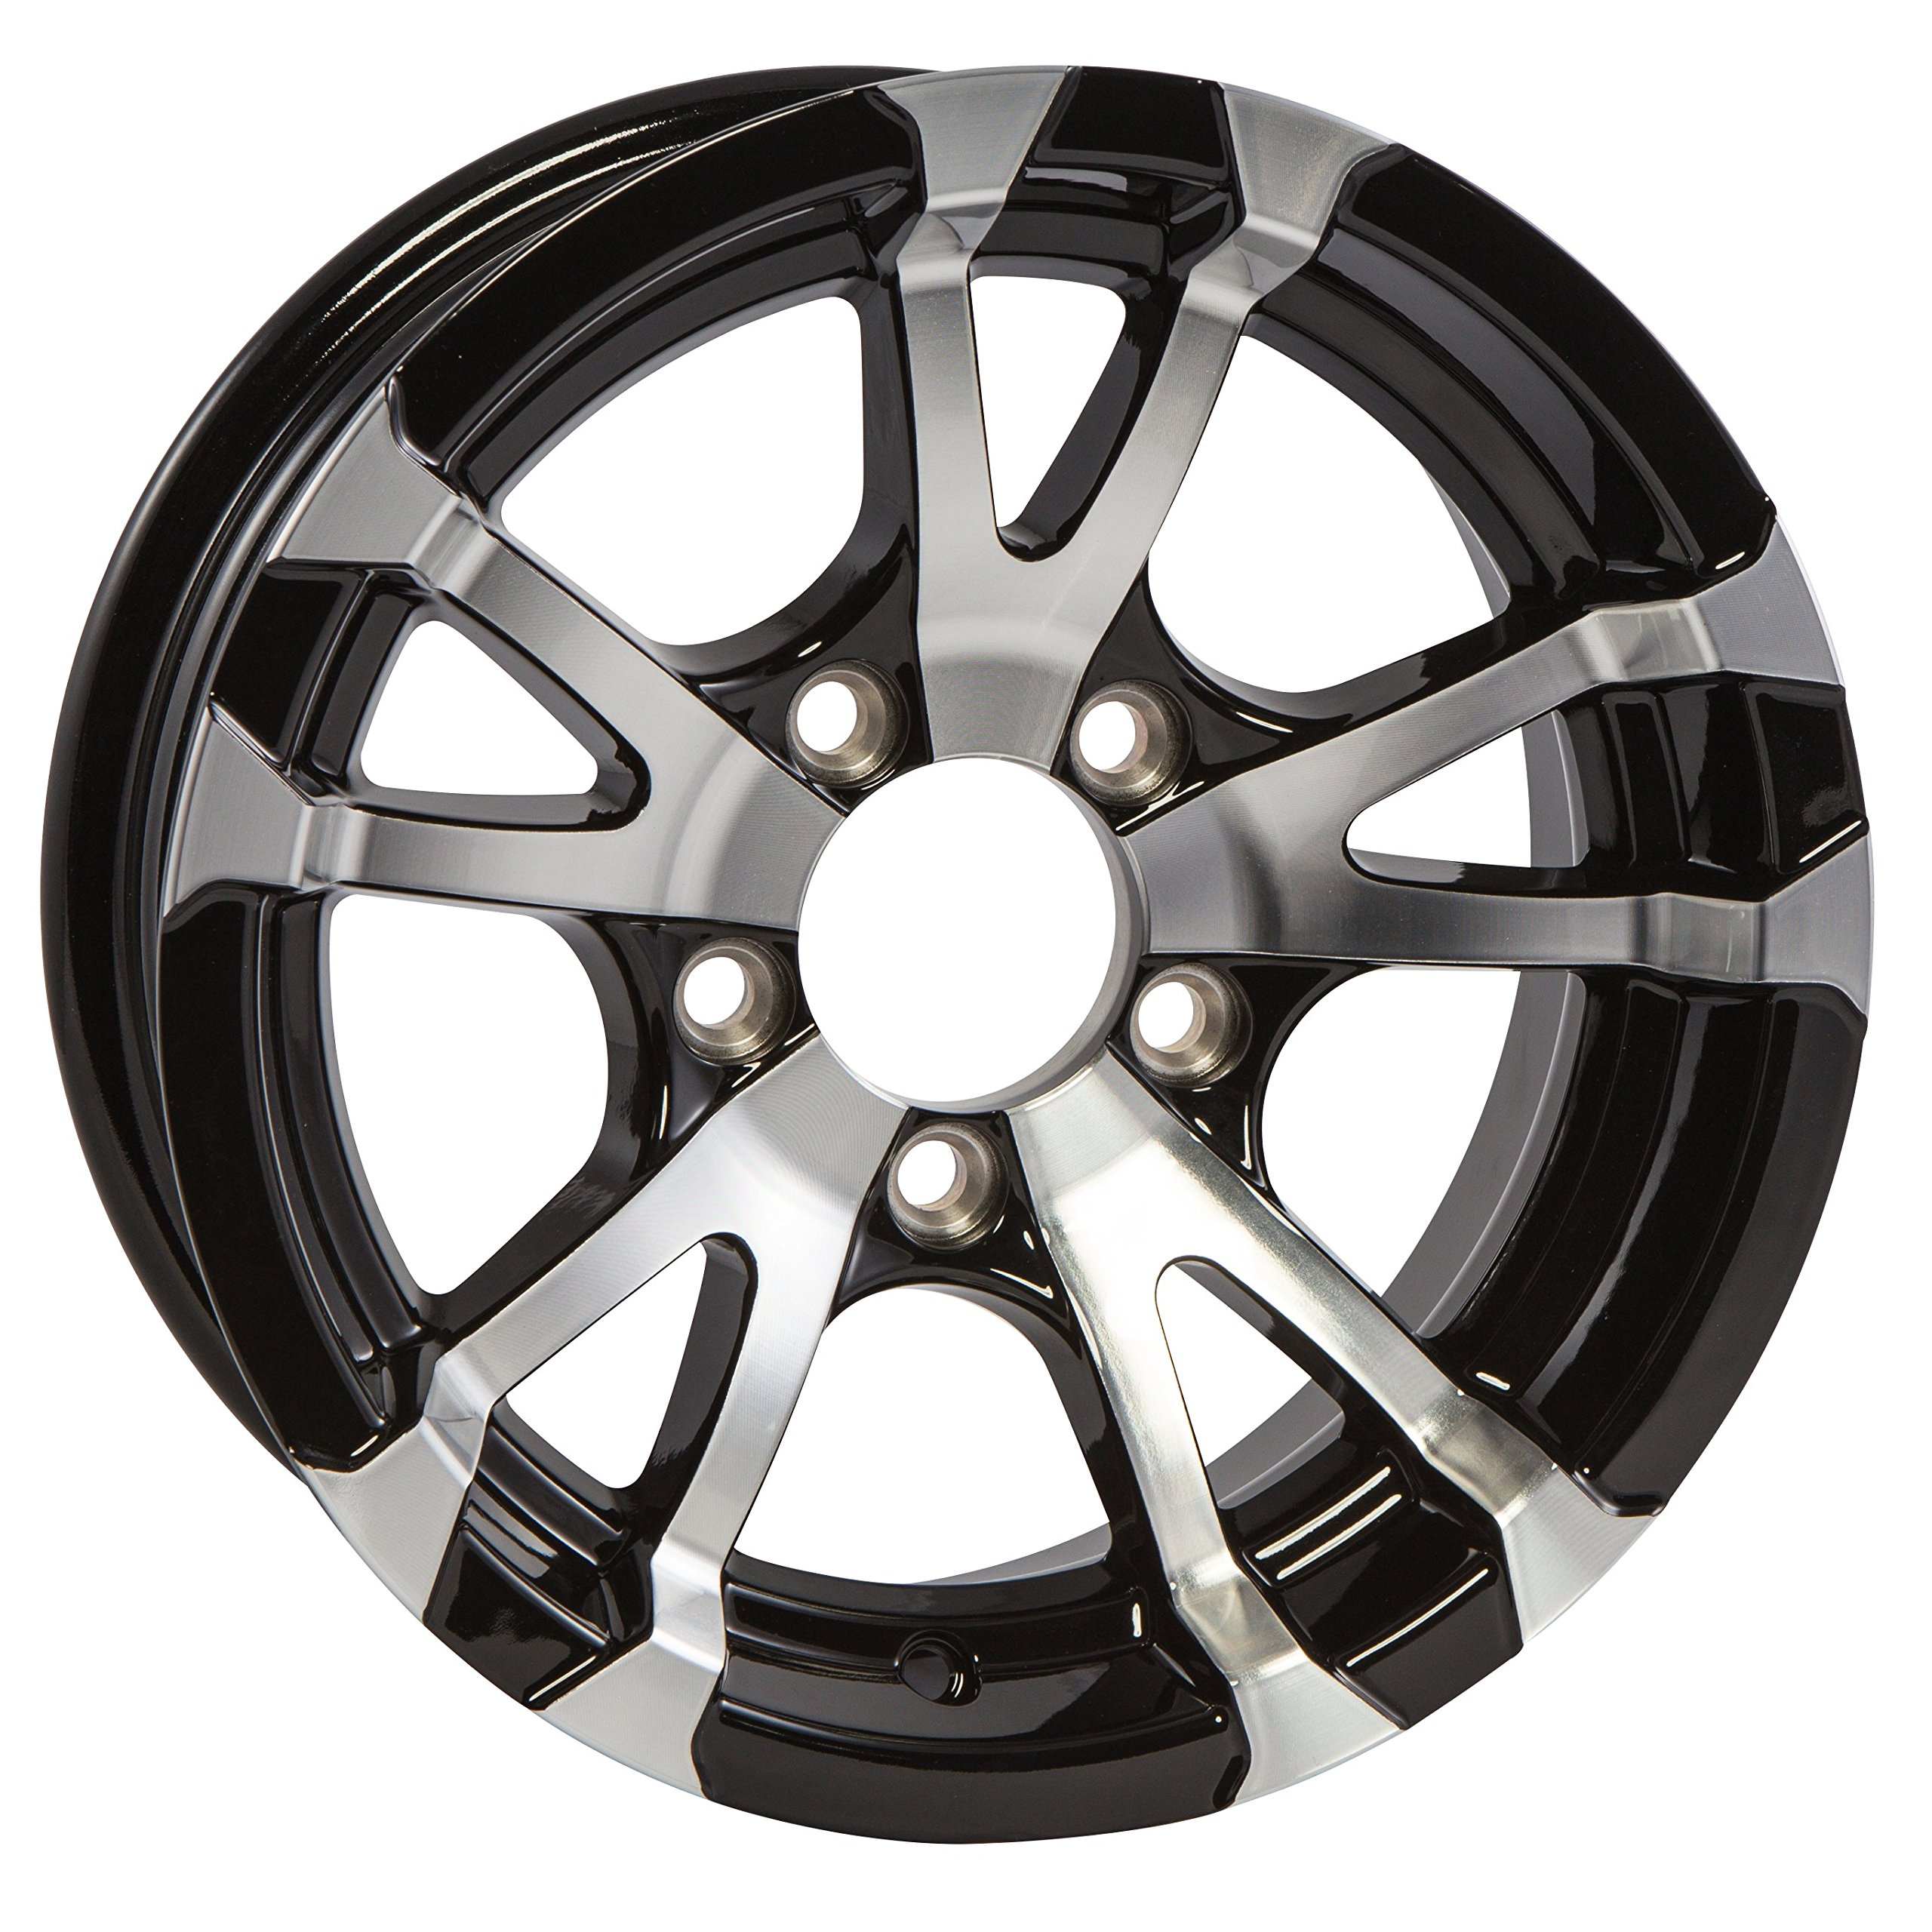 eCustomRim Aluminum Boat Camper Trailer Rim Wheel 5 Lug 13'' Avalanche V-Spoke/Black